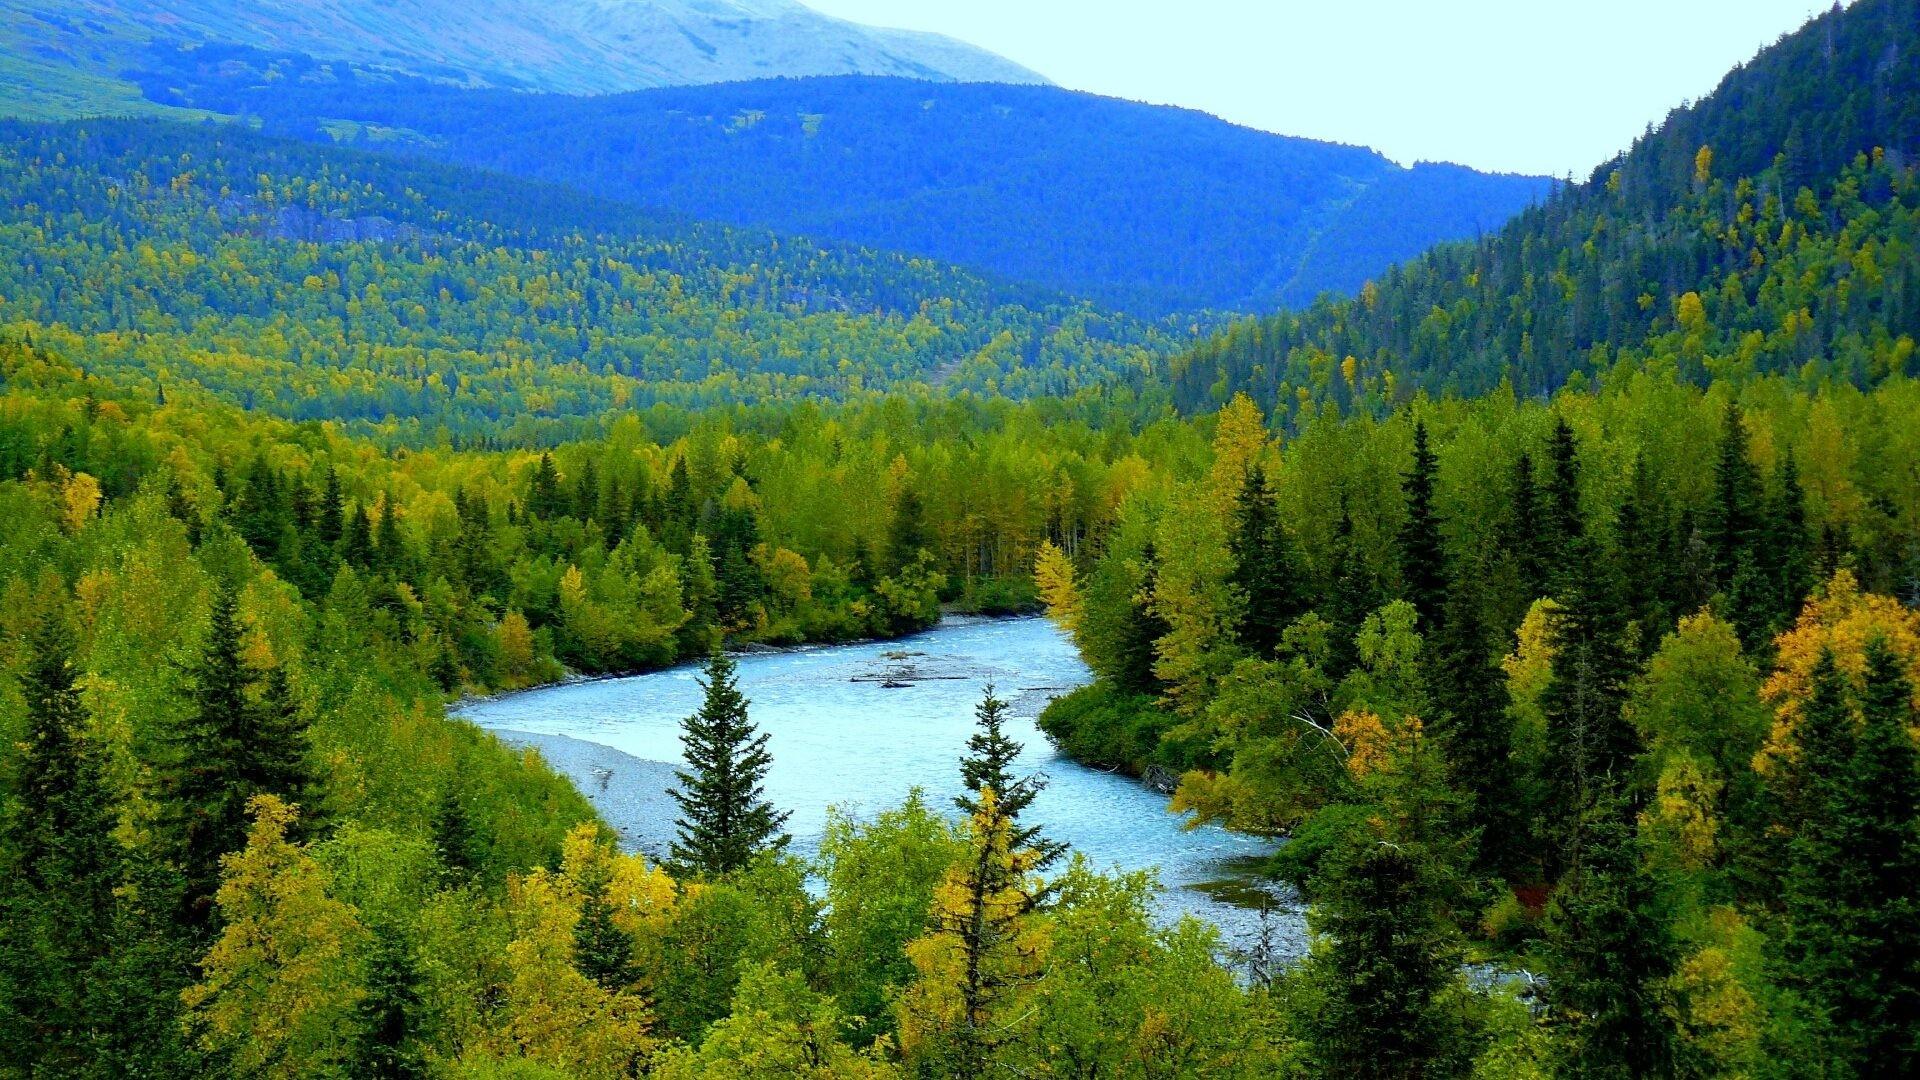 Alaska wallpaper screensaver 56 images - Hd wilderness wallpapers ...